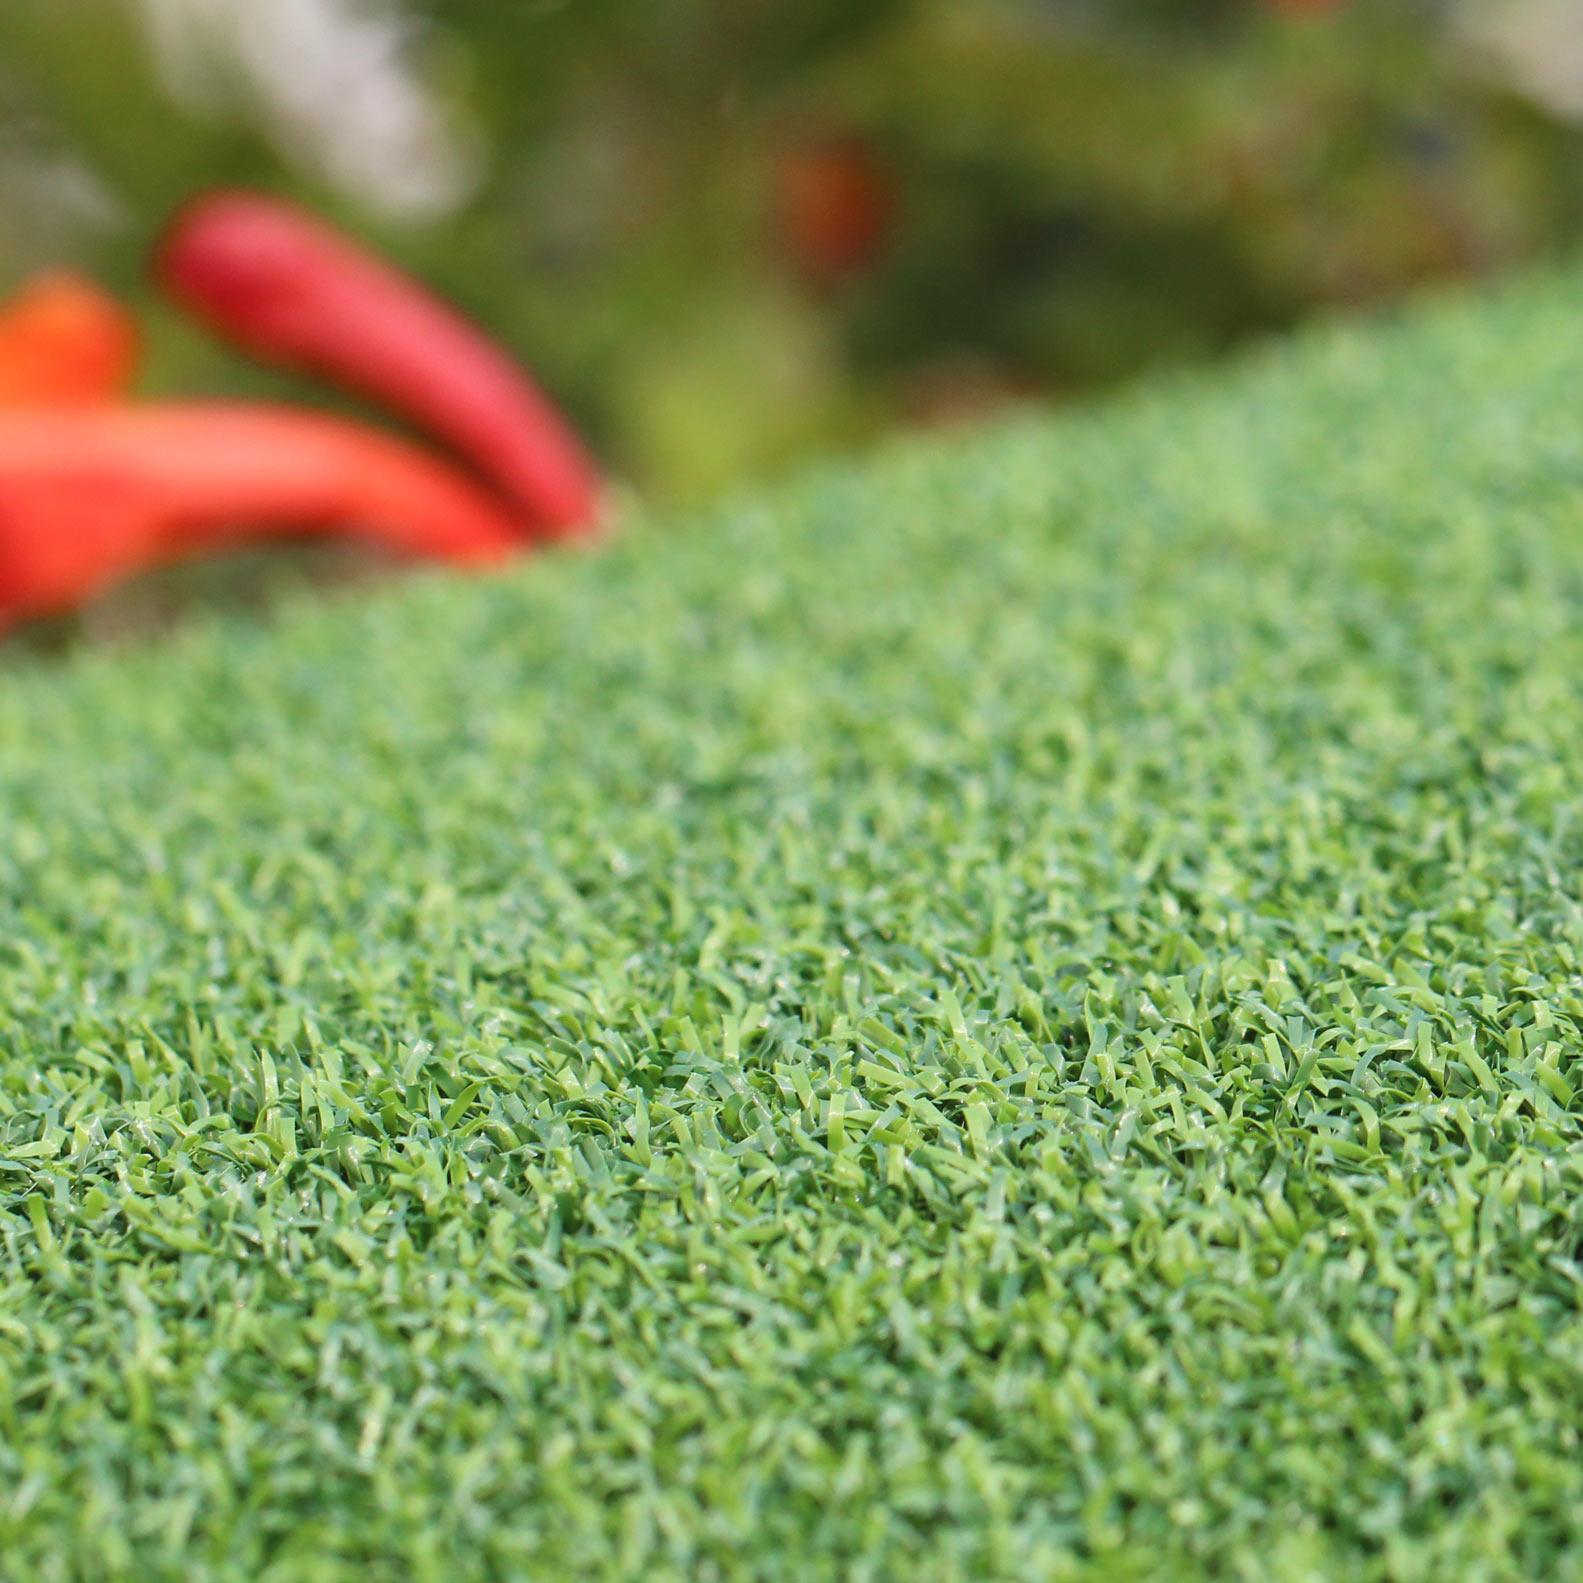 Putt 60 ounces golf putting greens bi-color